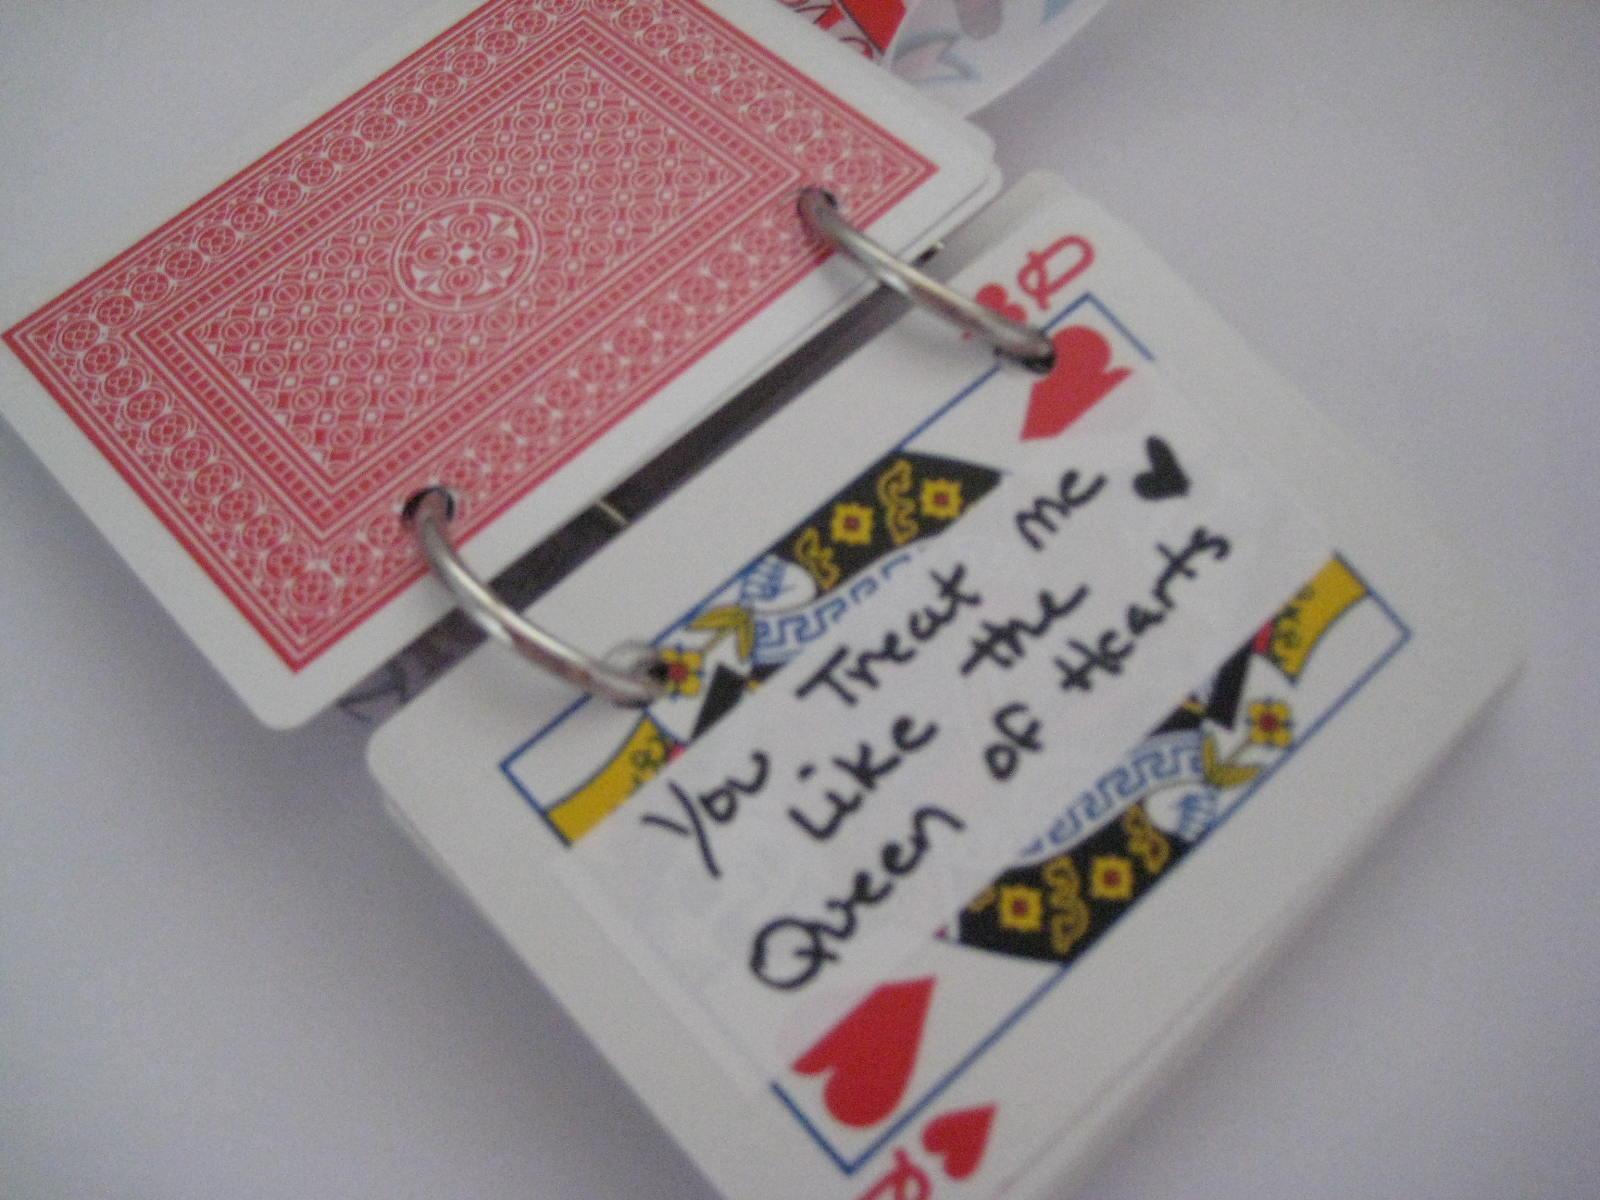 52 Reasons Why I Love You Cards Ideas   www.imgkid.com ...